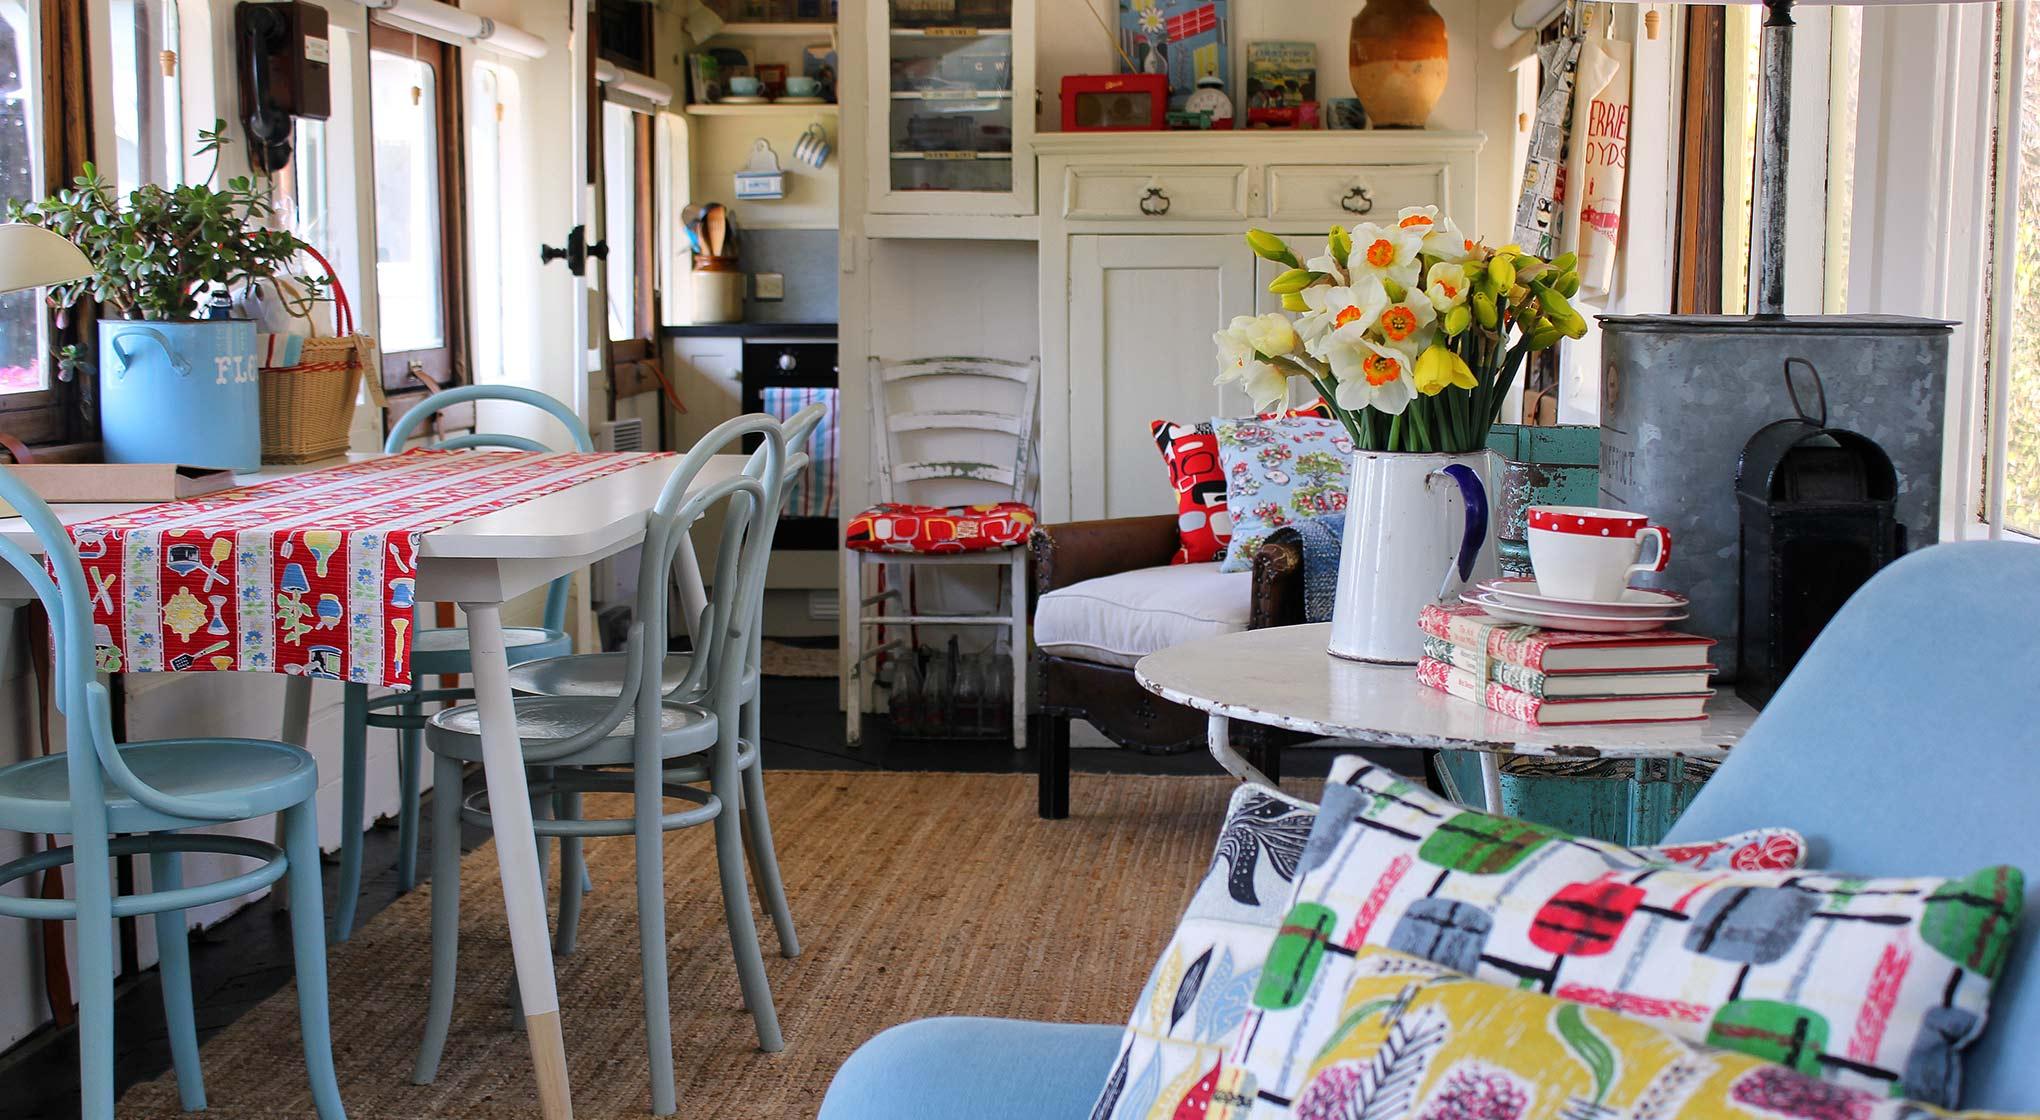 Interior-Carriage towards kitchen.jpg